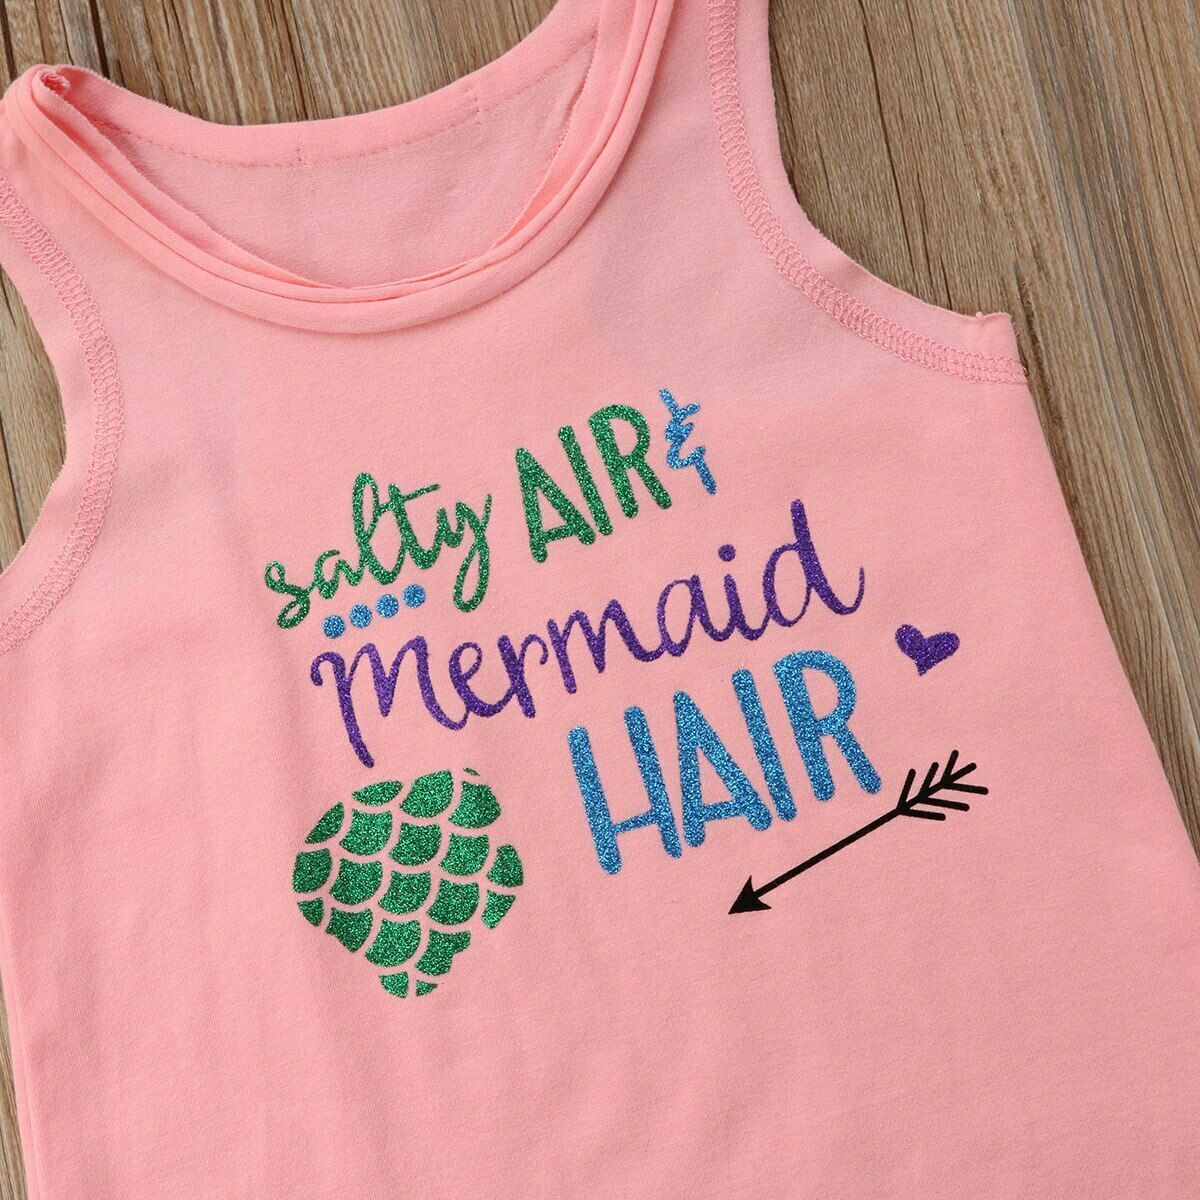 Kid Baby Girl Sleeveless Beach Princess Top Dress Summer Sundress Clothes Outfit